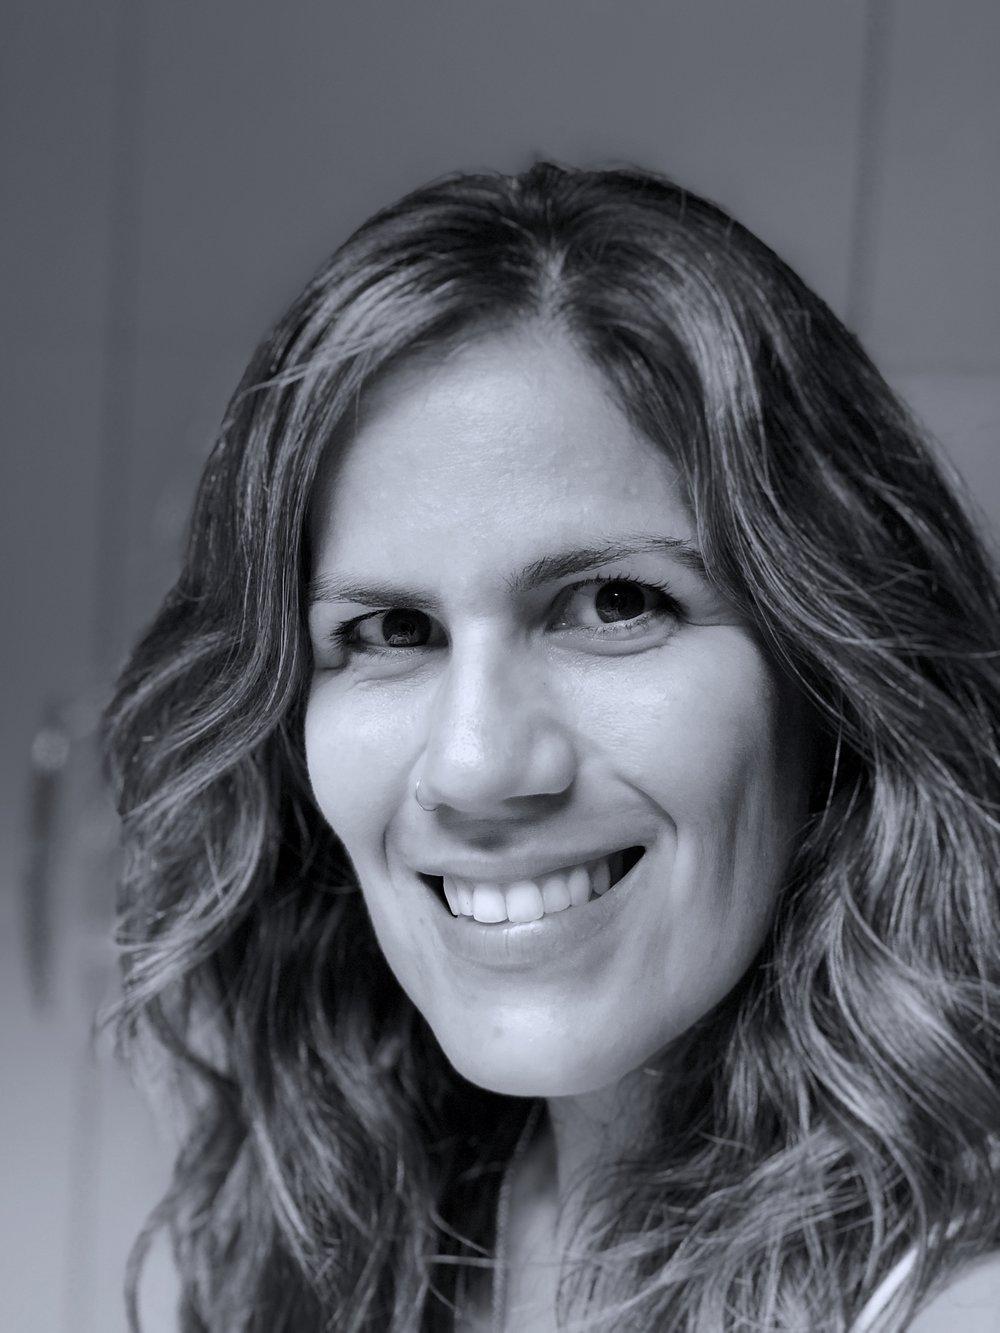 Hazel Swayne    Experience Learning Designer + Facilitator at Hyper Island.  Co-Founder of the Learning Gypsies.